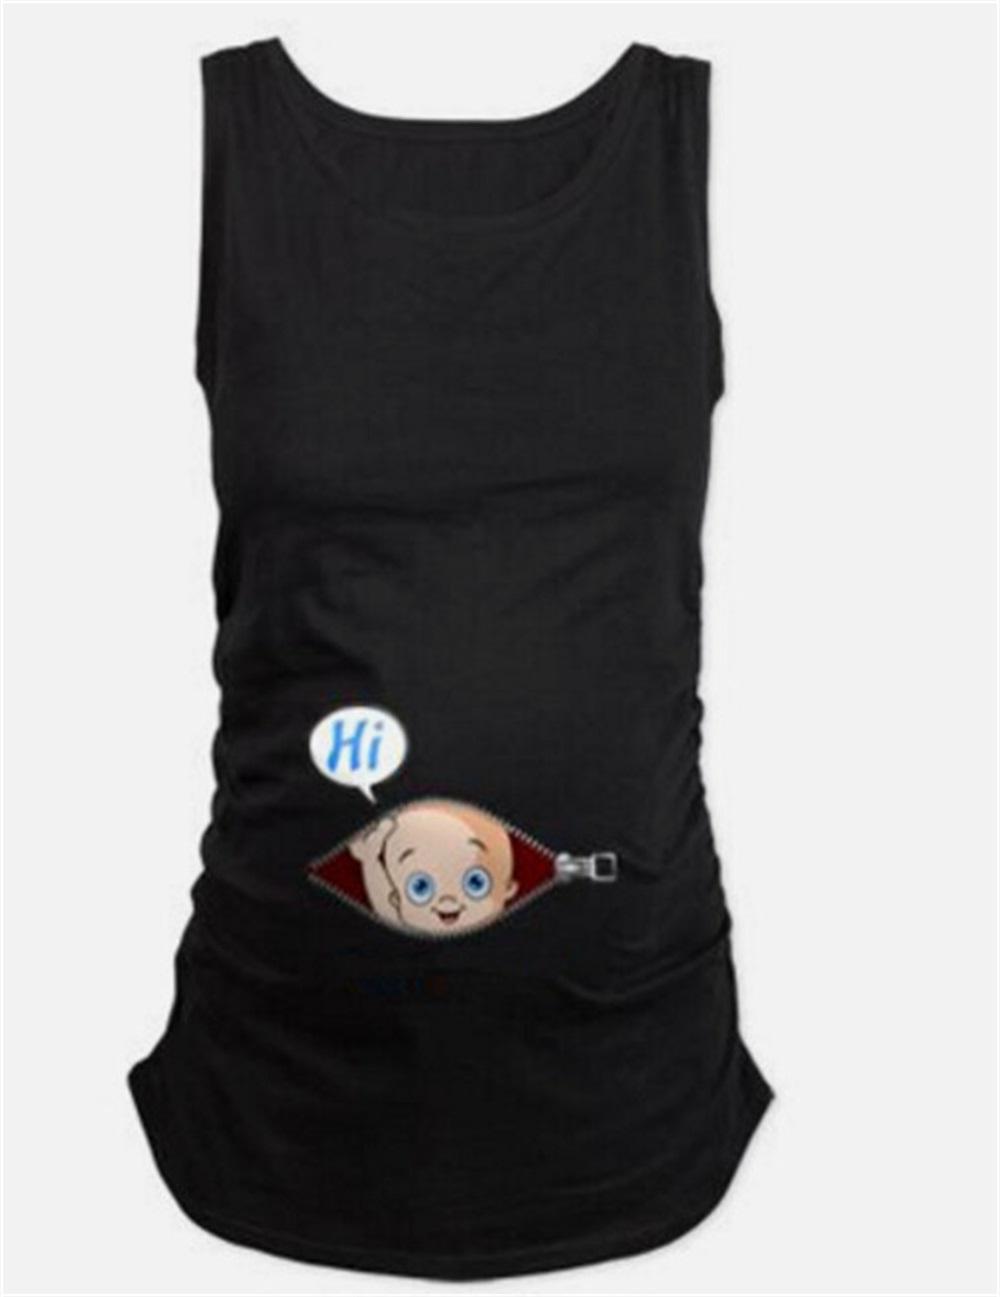 3d5d3902cef 2019 EASY BIG Summer Original Pregnant Women T Shirts Maternity Tees  Clothes Nursing Top Vest Pregnancy Long Tee Shirts Ropa MC0025 From  Runbaby, ...